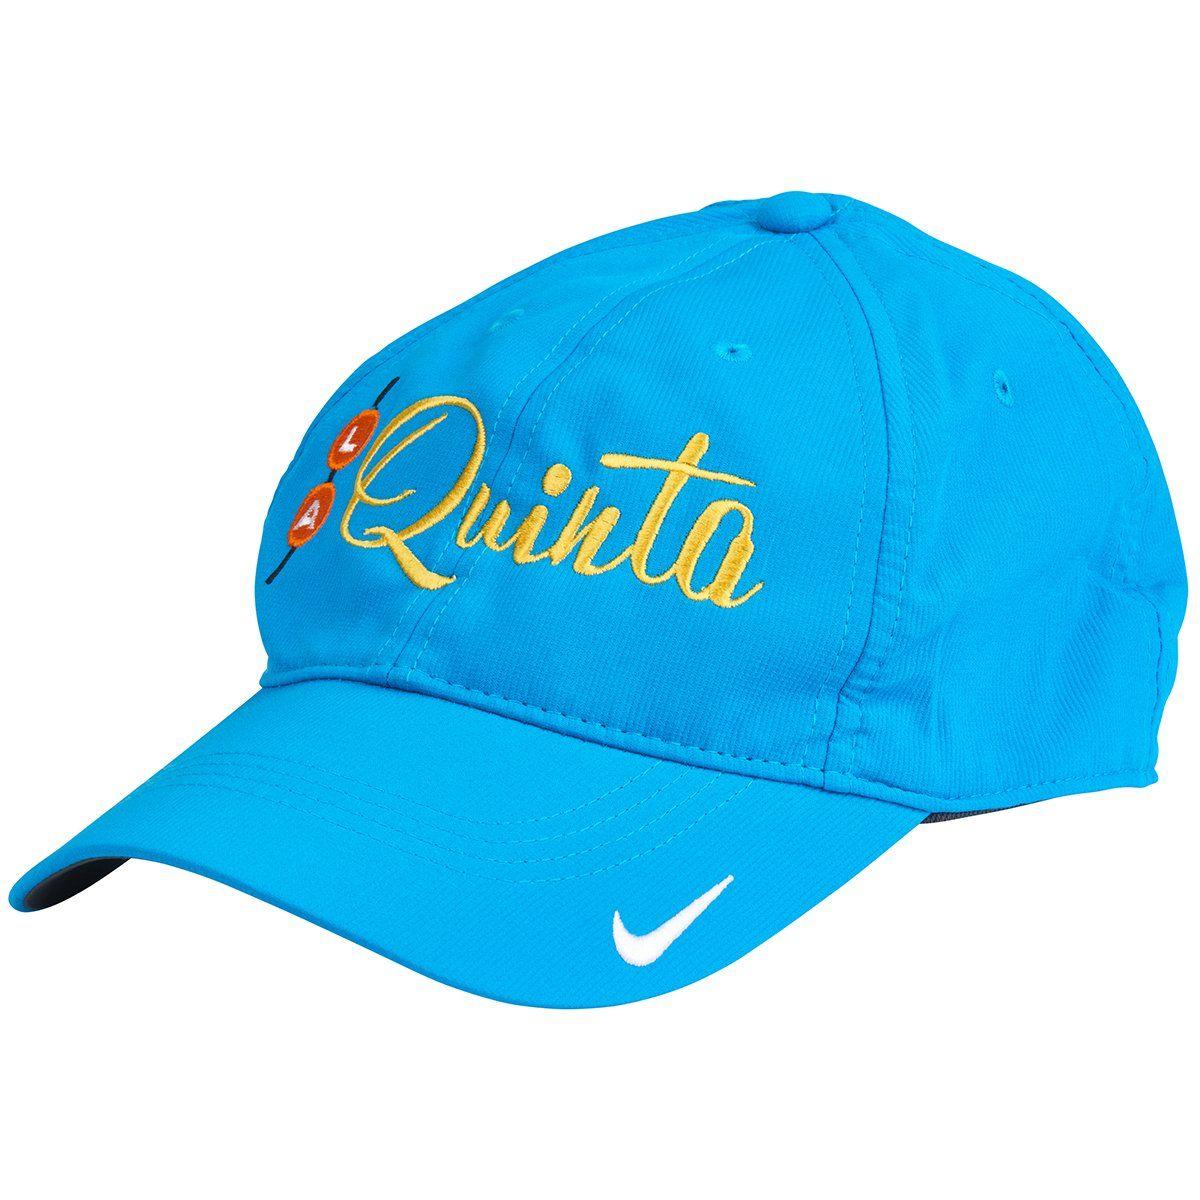 b6ccc221261 top quality nike kansas city royals light blue classic adjustable  performance hat e11dc 66ed8; hot la quinta nike baseball golf cap 9c526  656dd